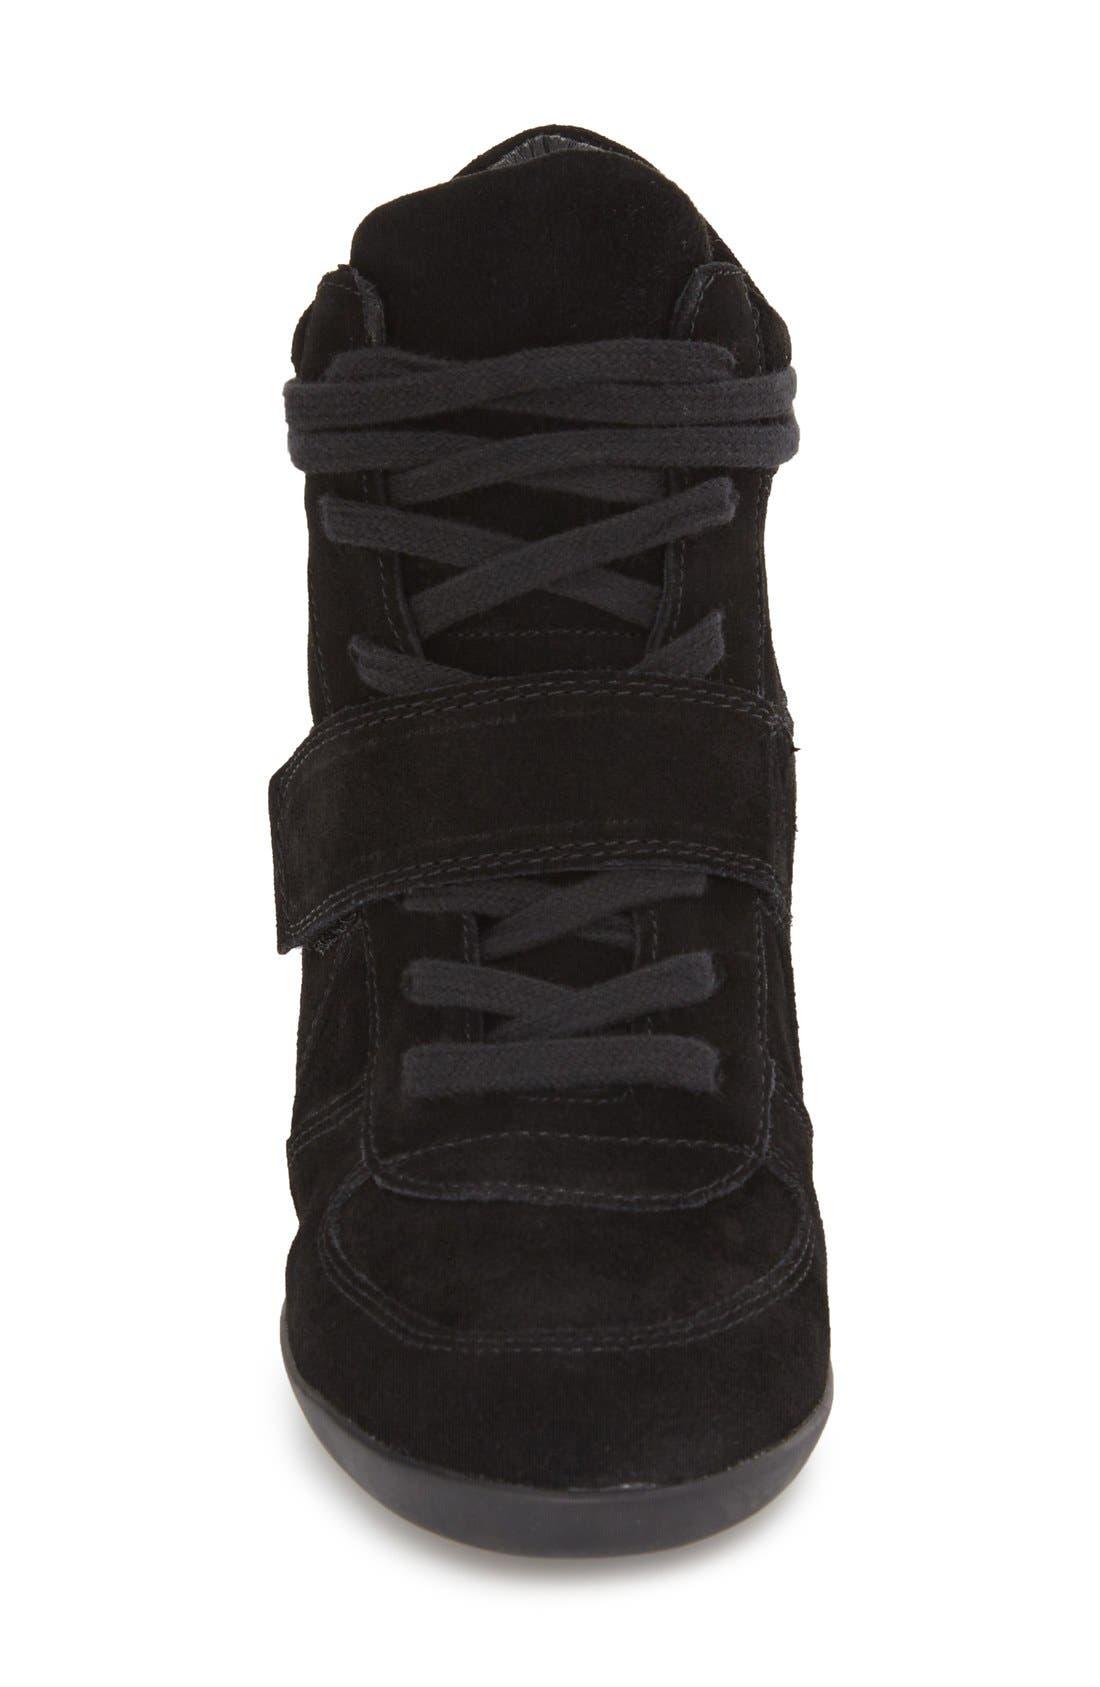 Alternate Image 3  - Ash 'Bowie' Sneaker